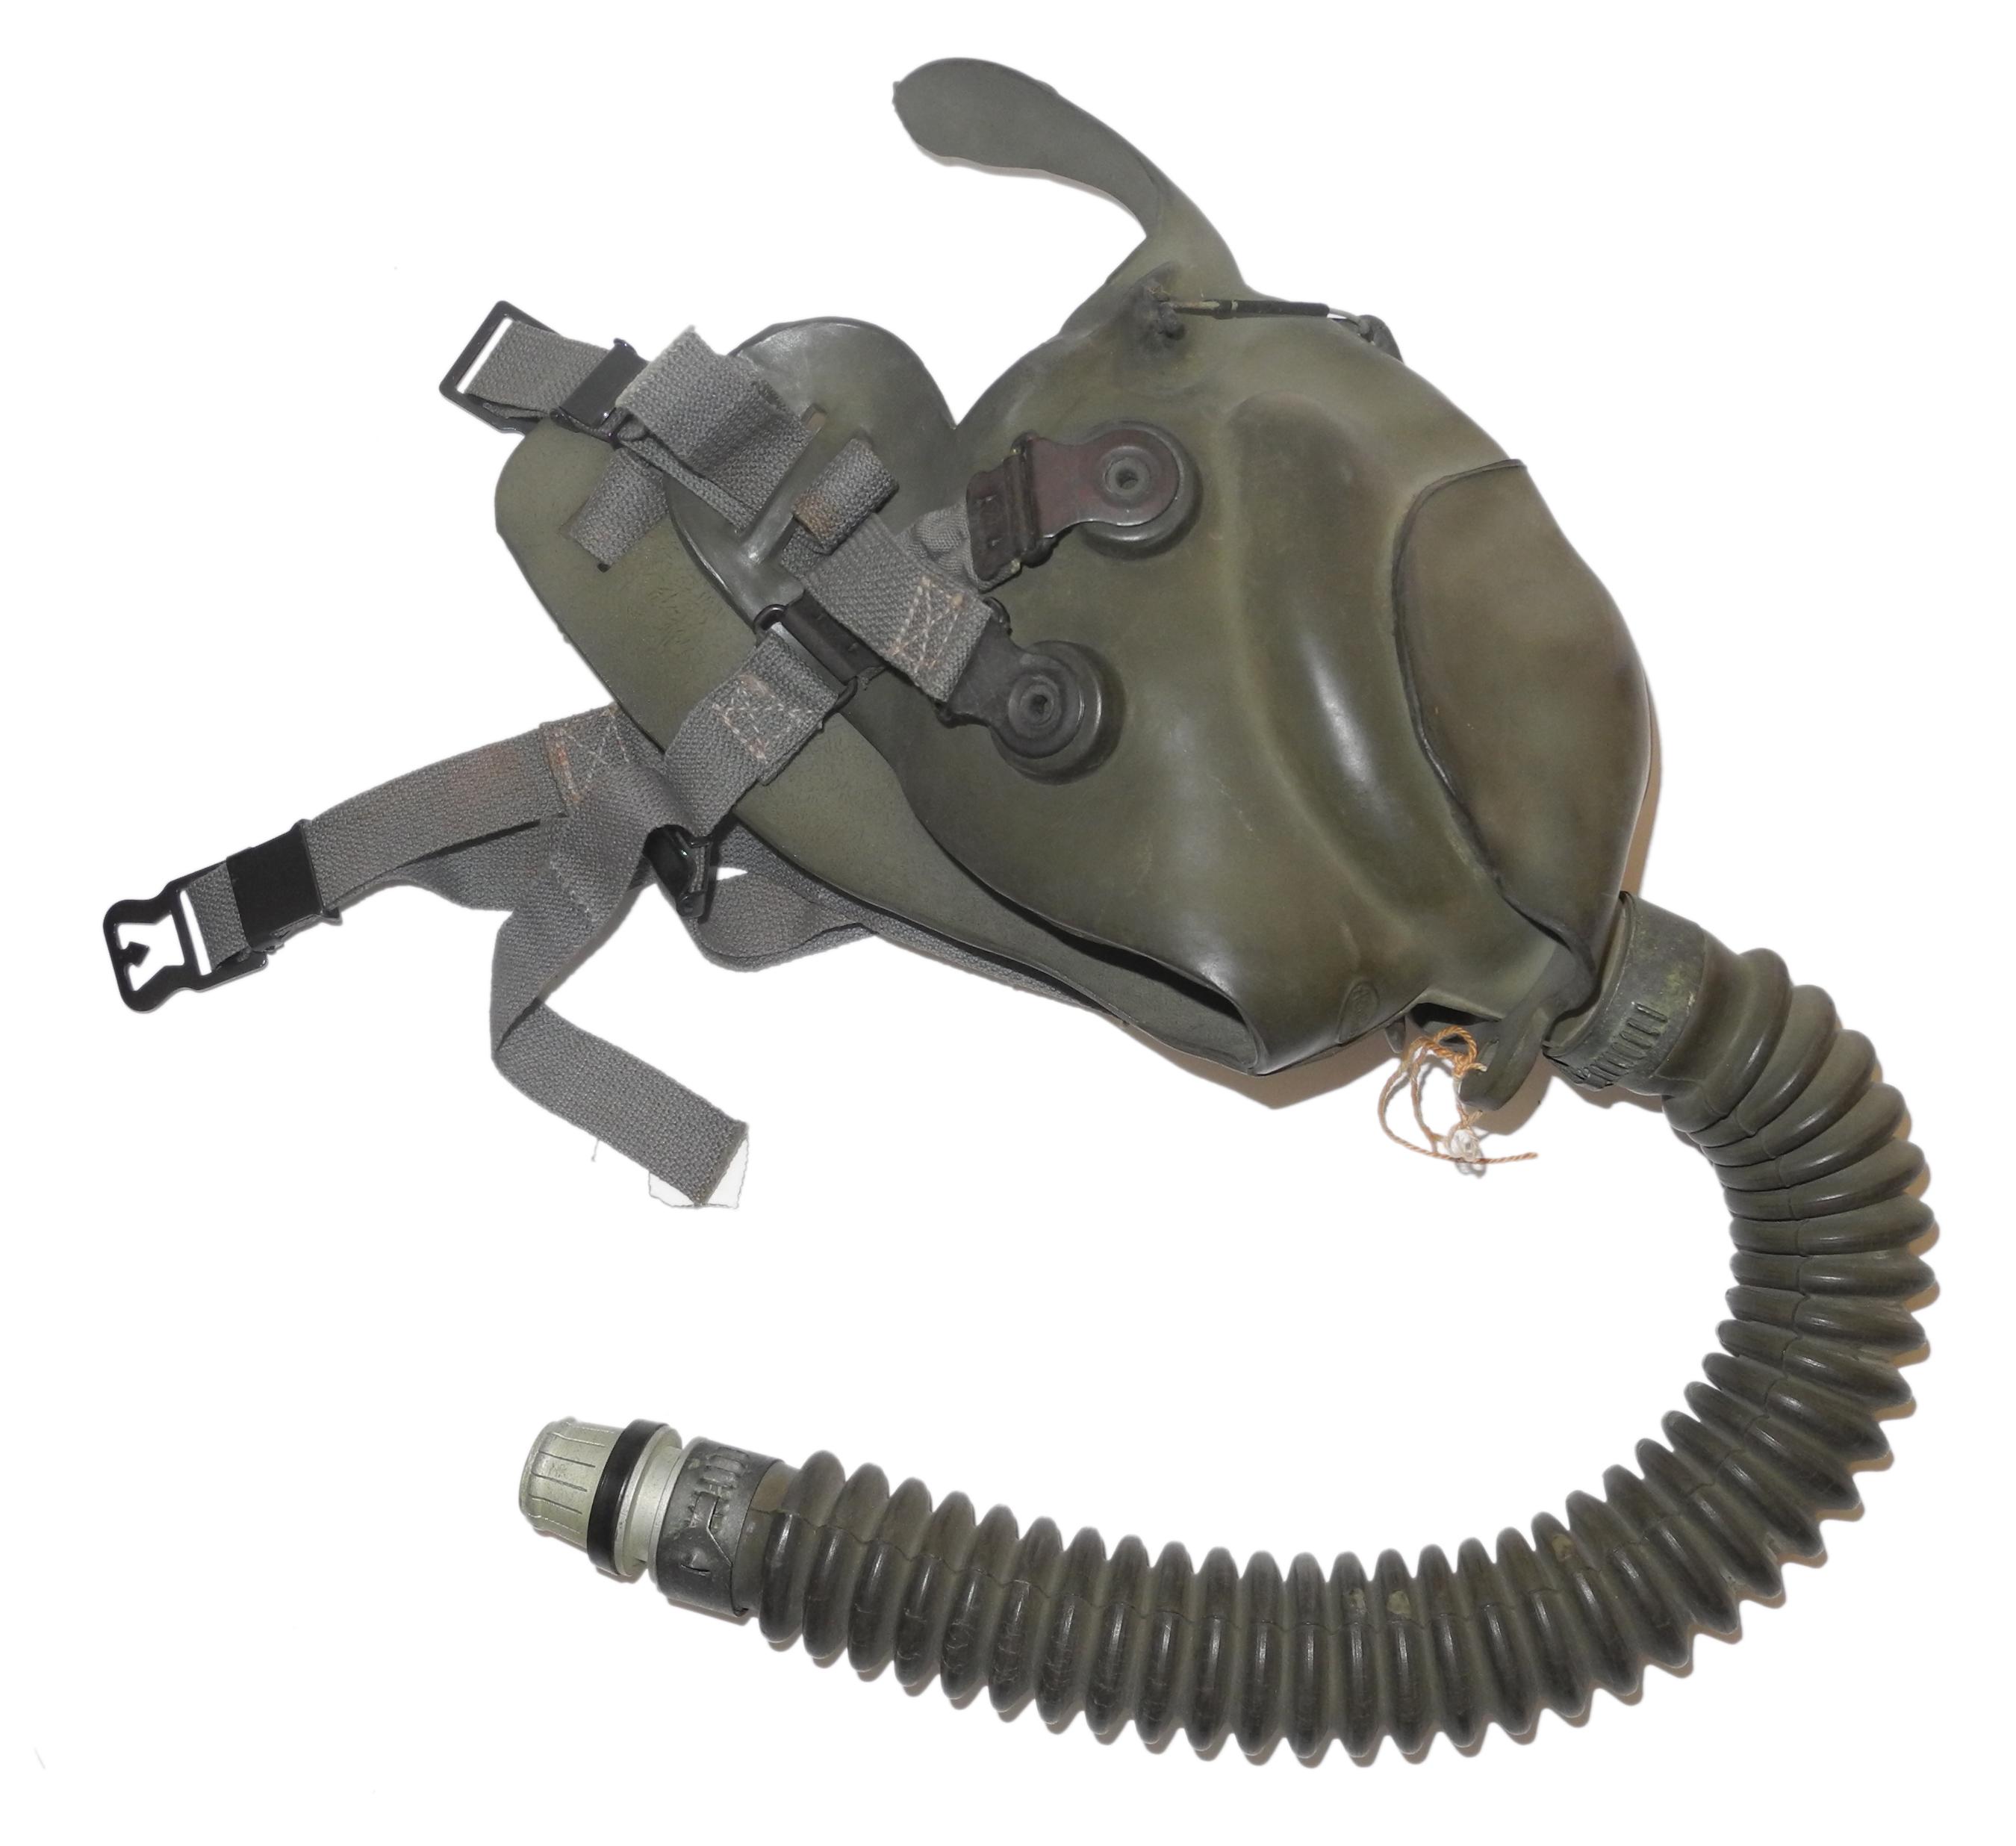 AAF A-10 Standard Oxygen mask